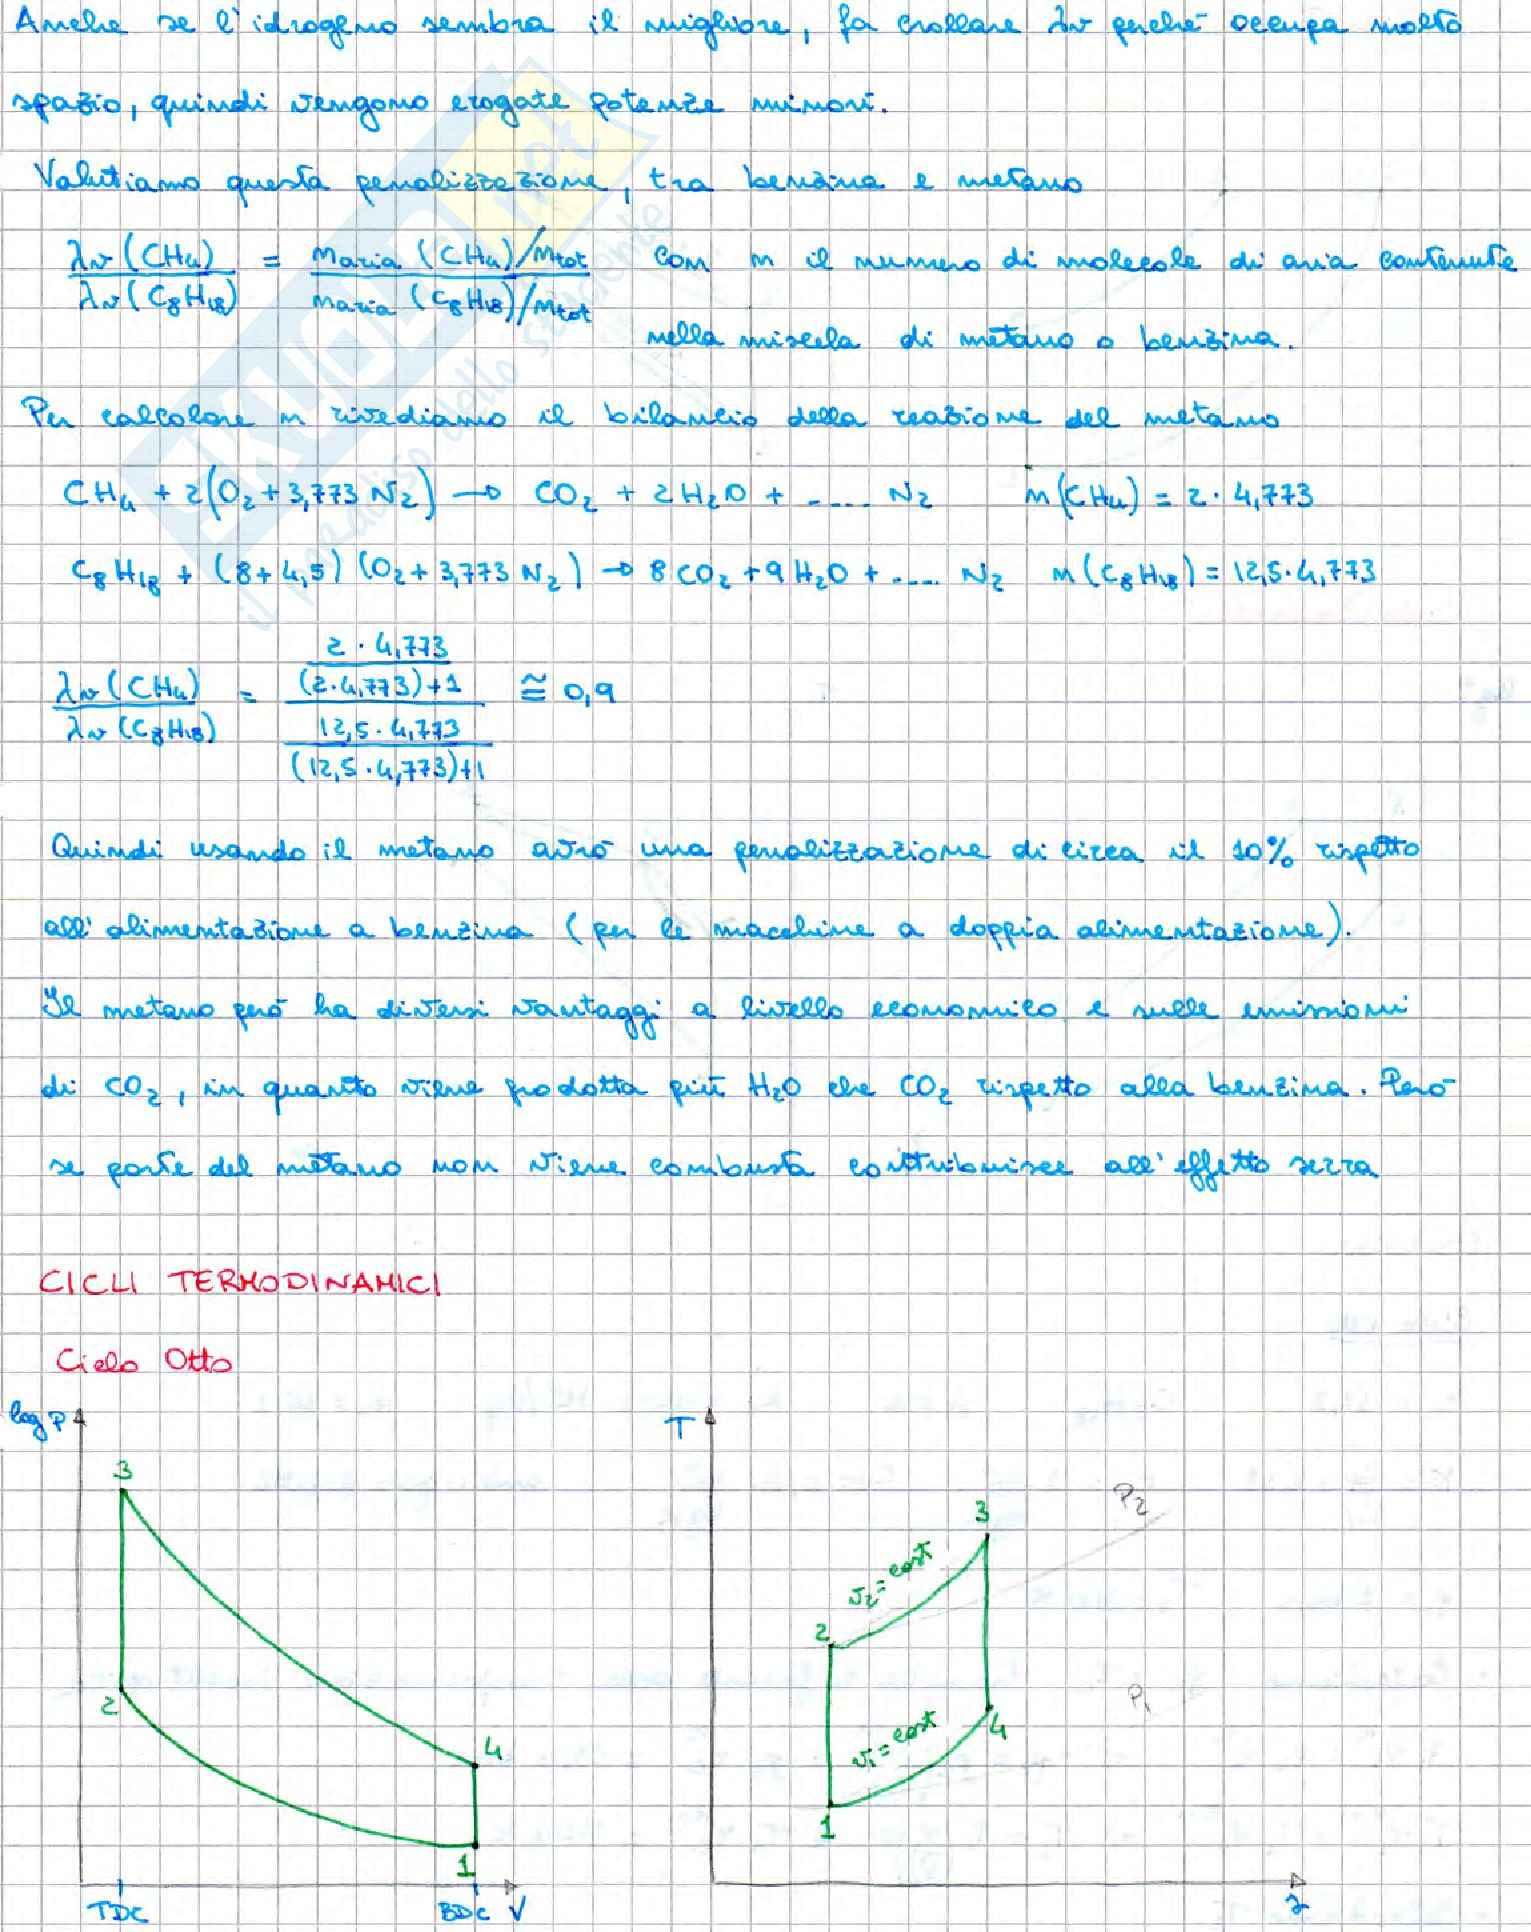 Motori a Combustione Interna - Appunti parte 1 Pag. 11